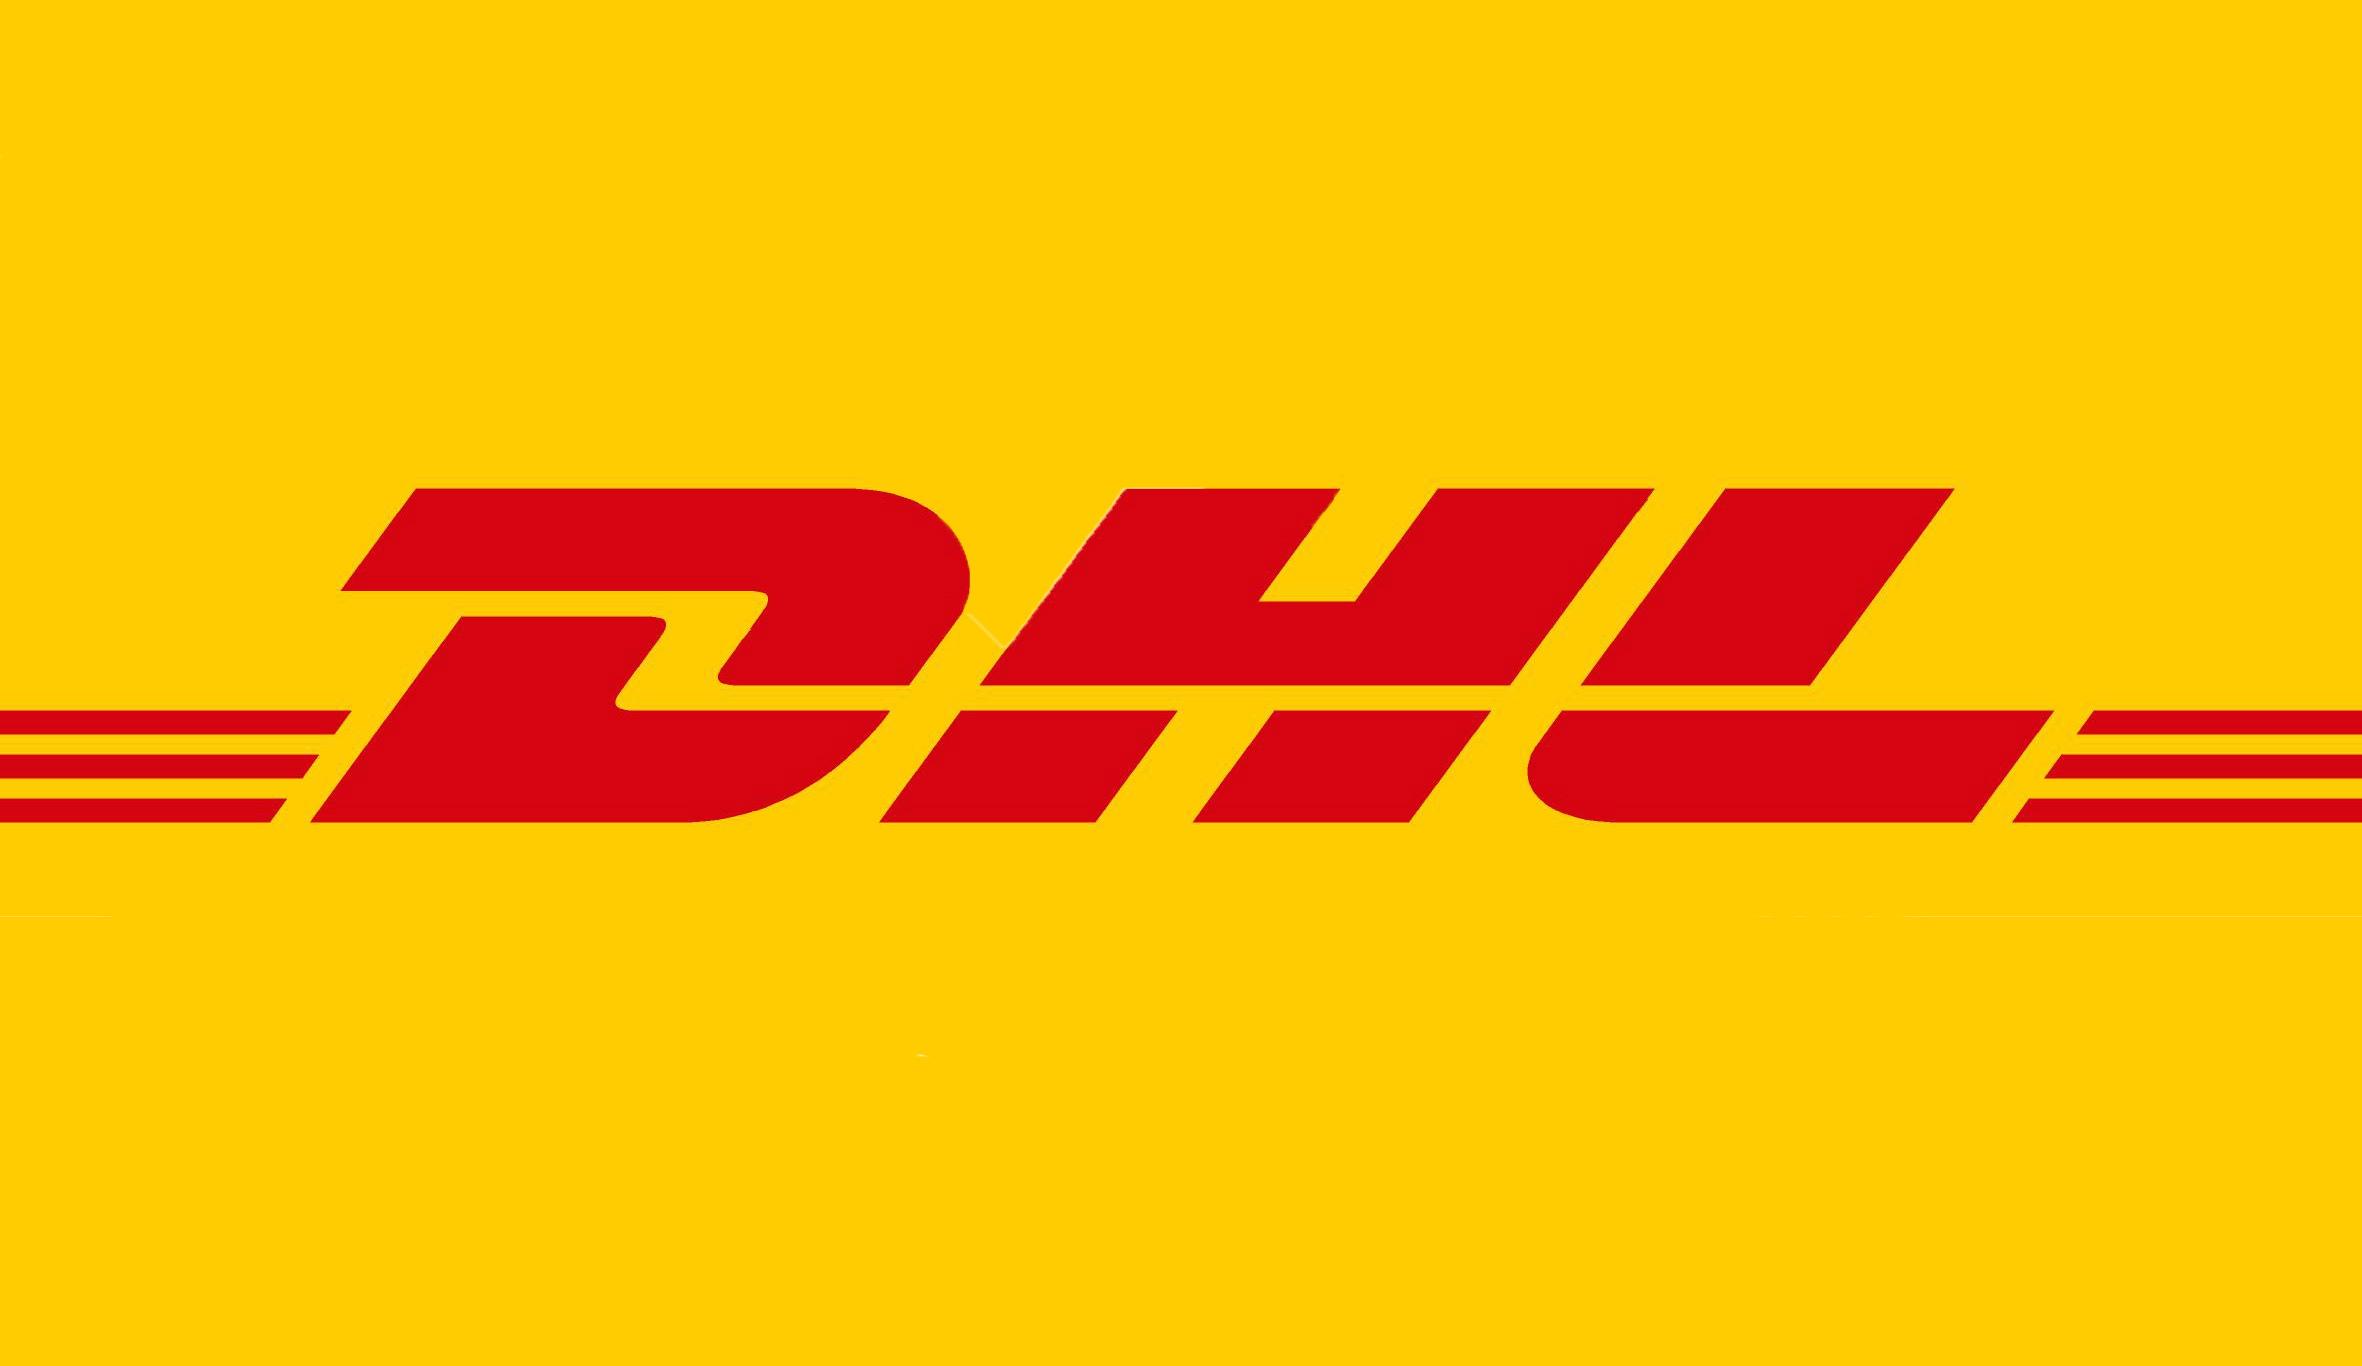 dhl_logo876.jpeg